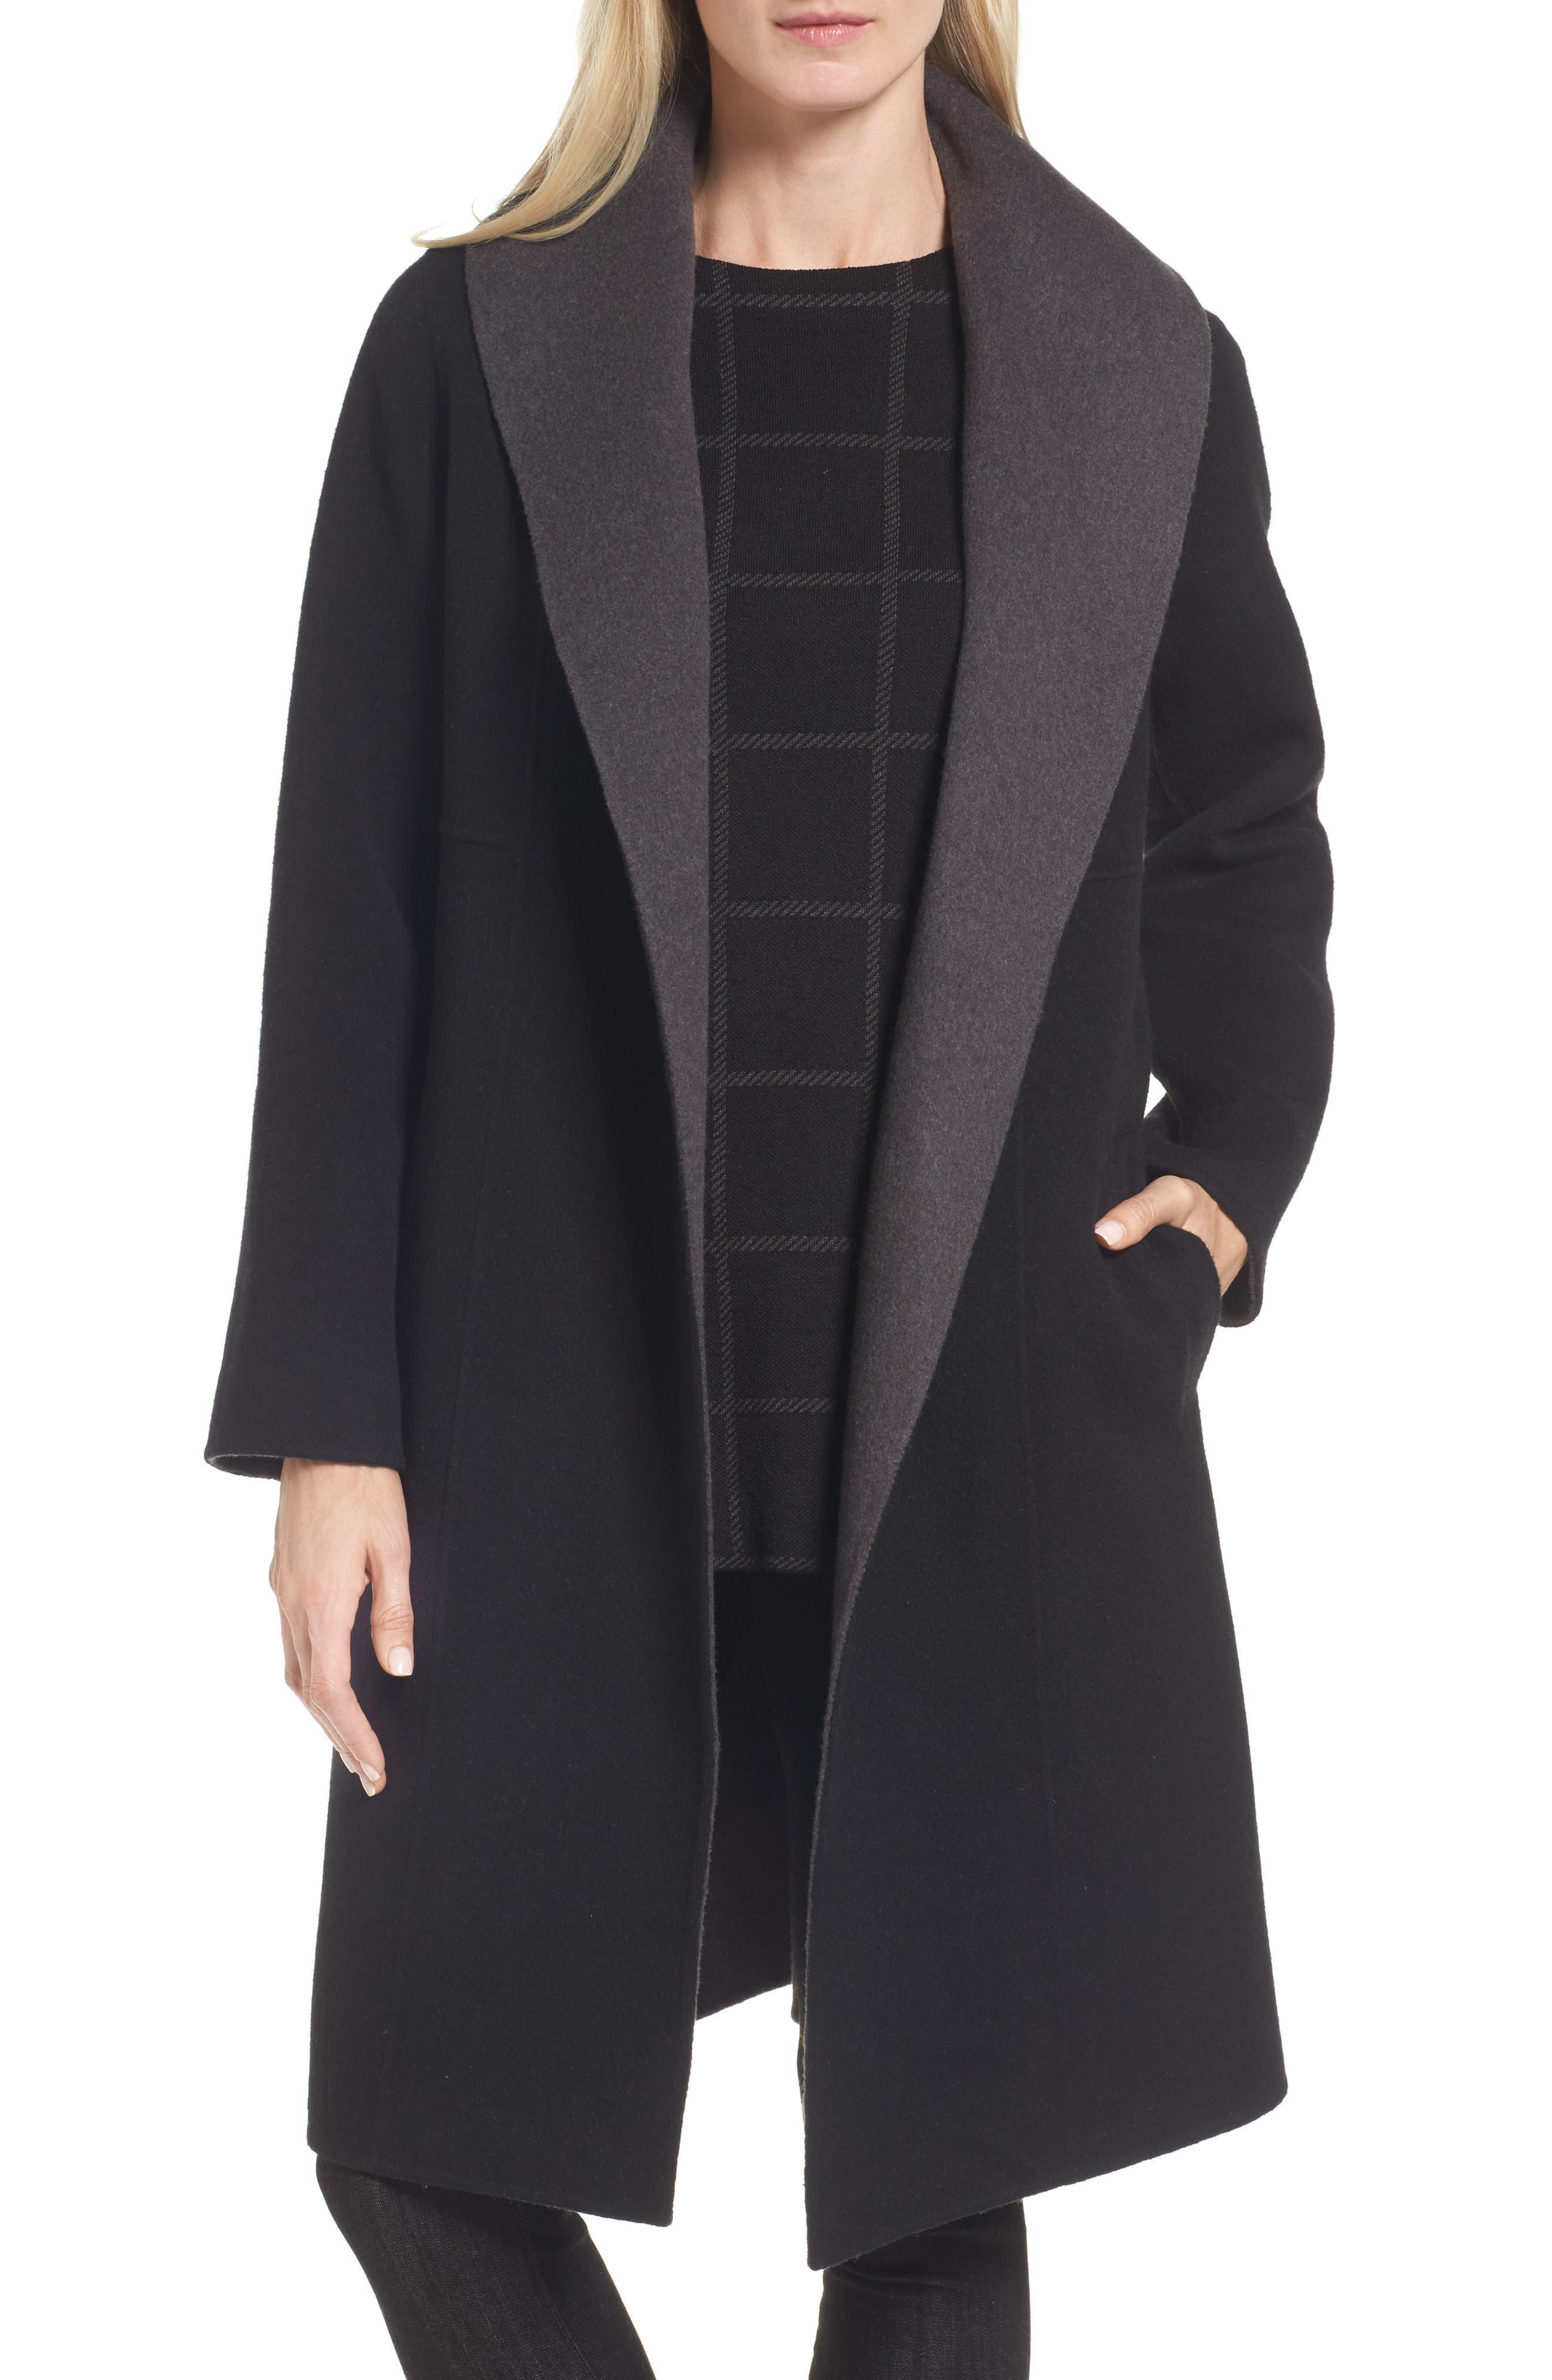 Eileen Fisher Double-Face Wool Blend Coat